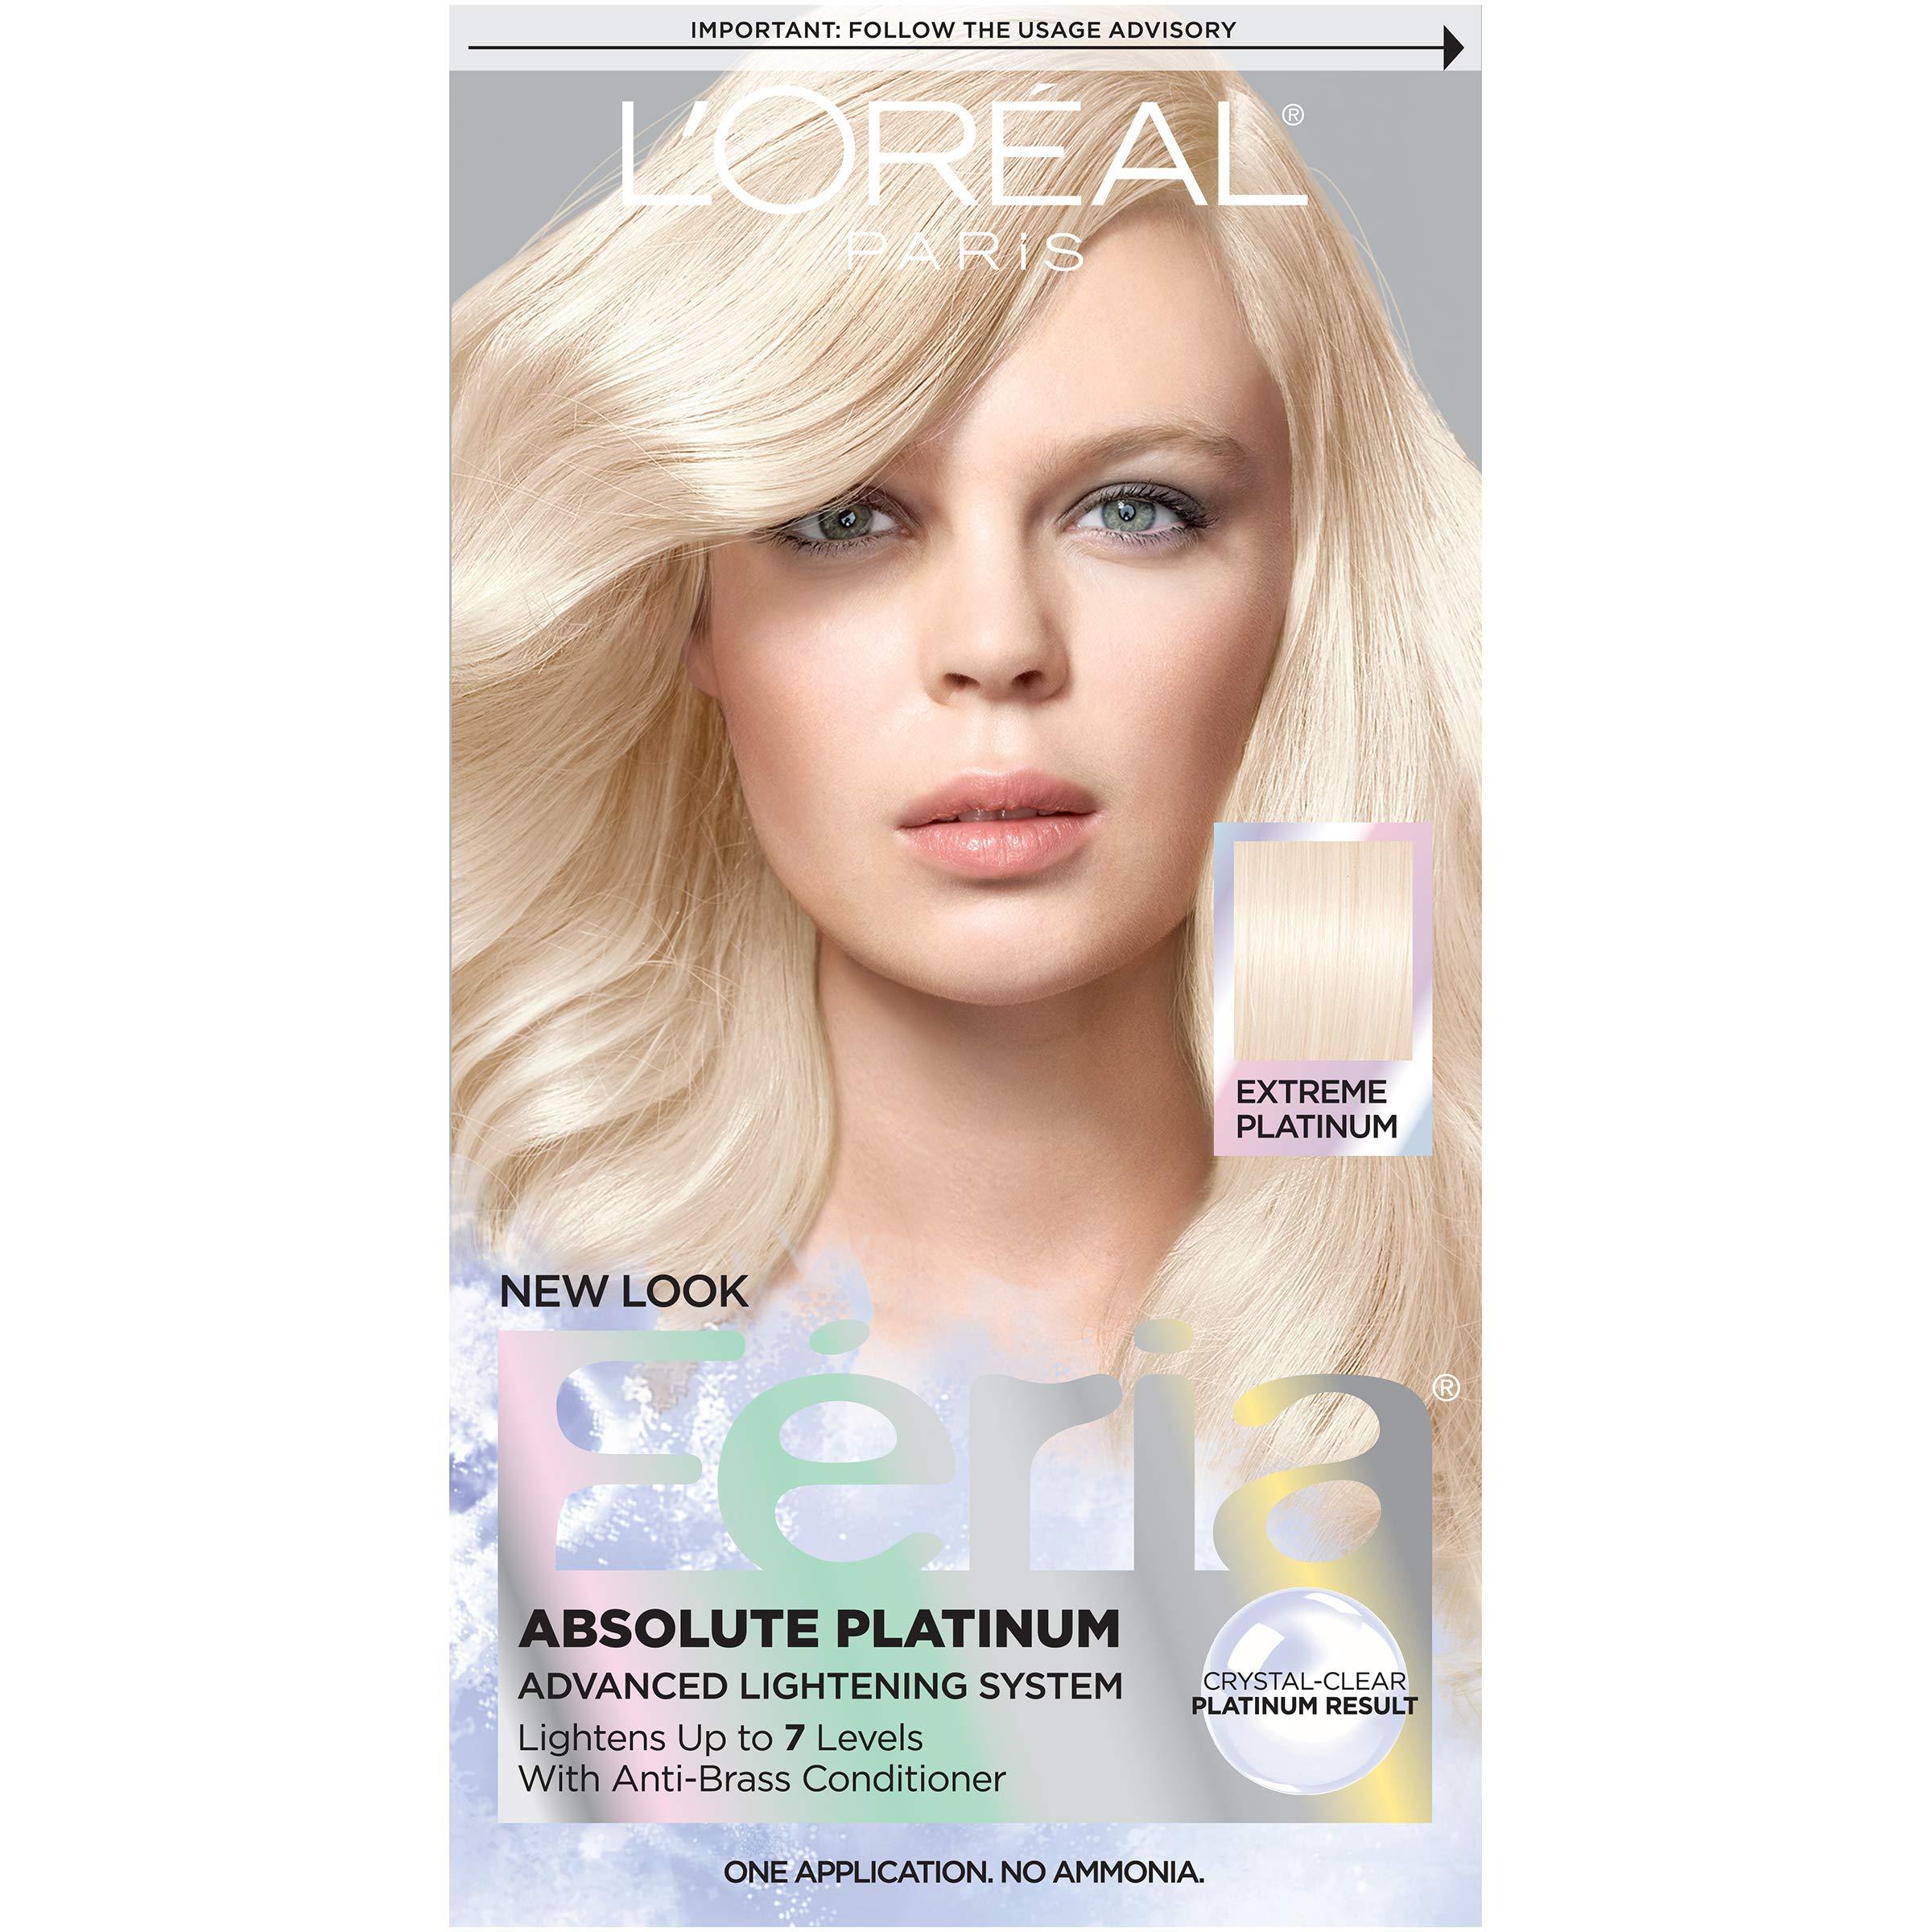 L'Oreal Feria Absolute Platinums Hair Color, Extreme Platinum 1 ea